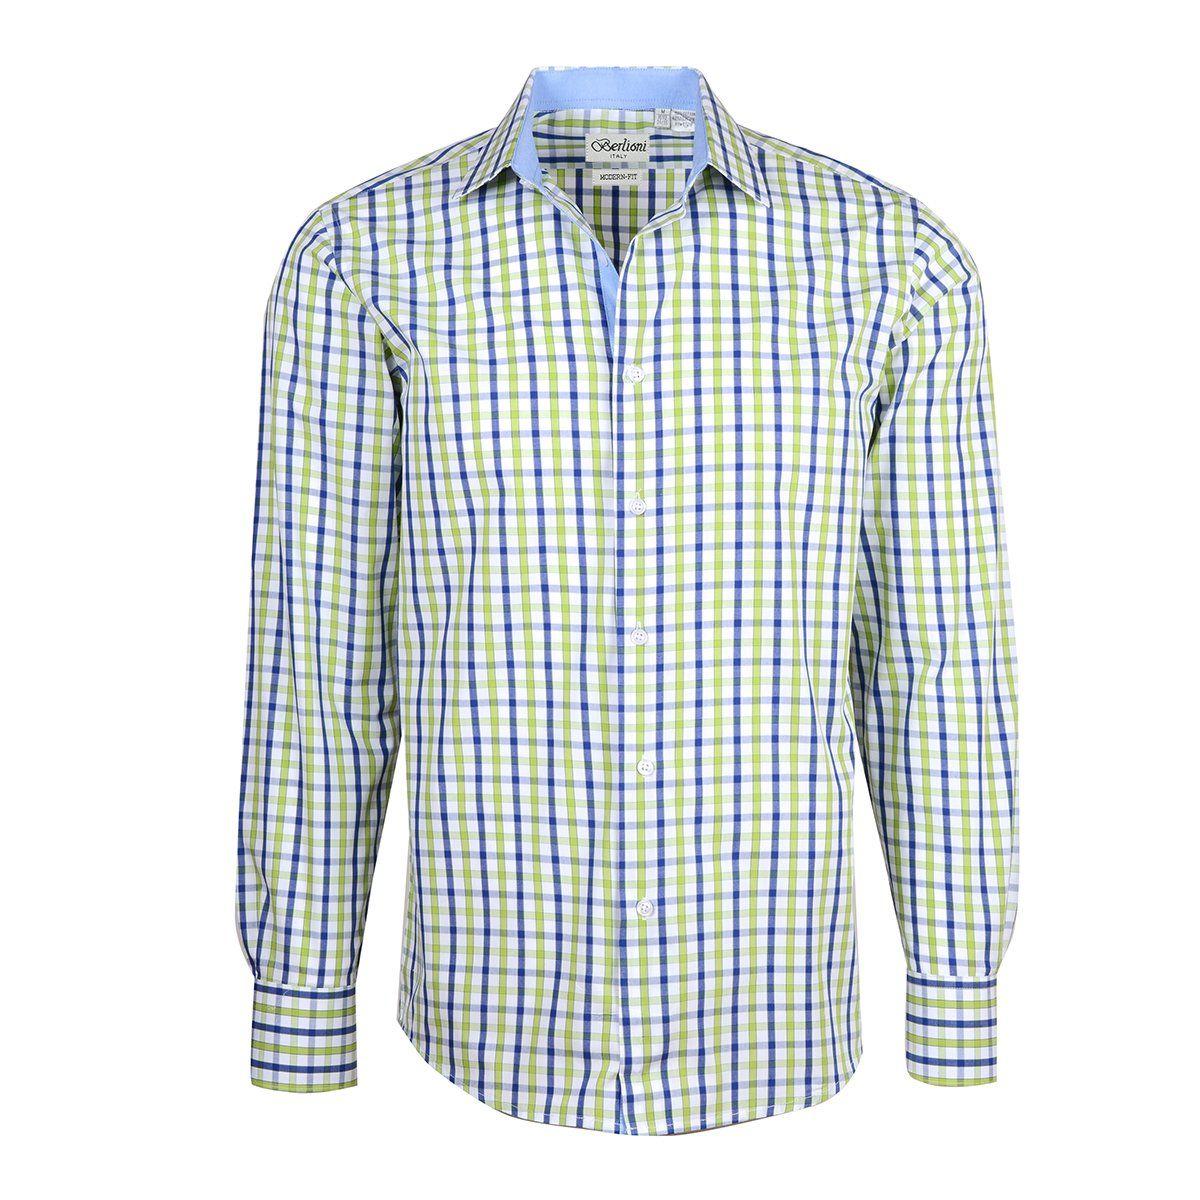 Green checkered dress shirt  Mens Checkered Plaid Dress Shirt Green Large  Neck